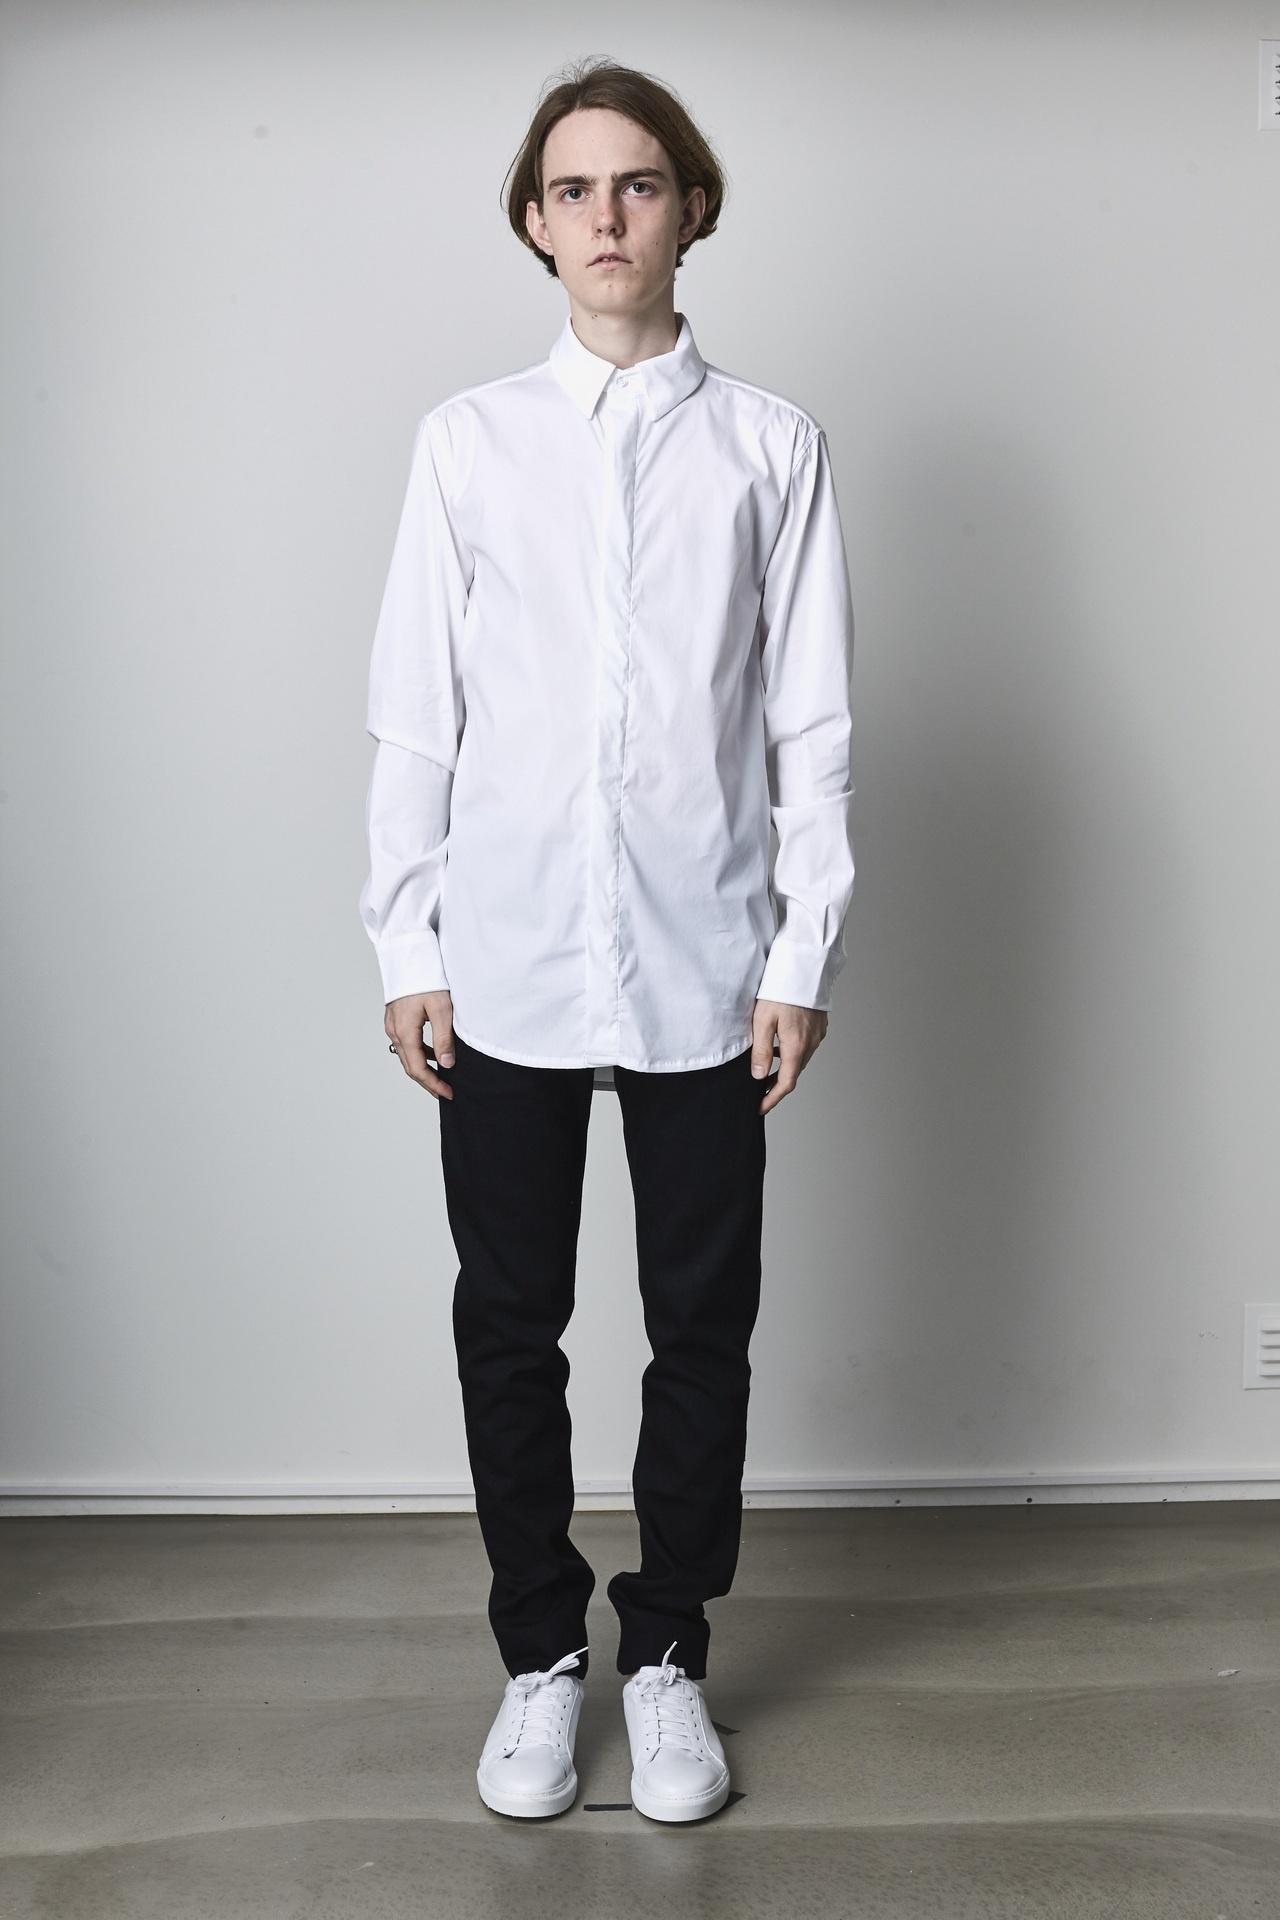 Livid Jeans - Edvard - Japan Comfort Black Image